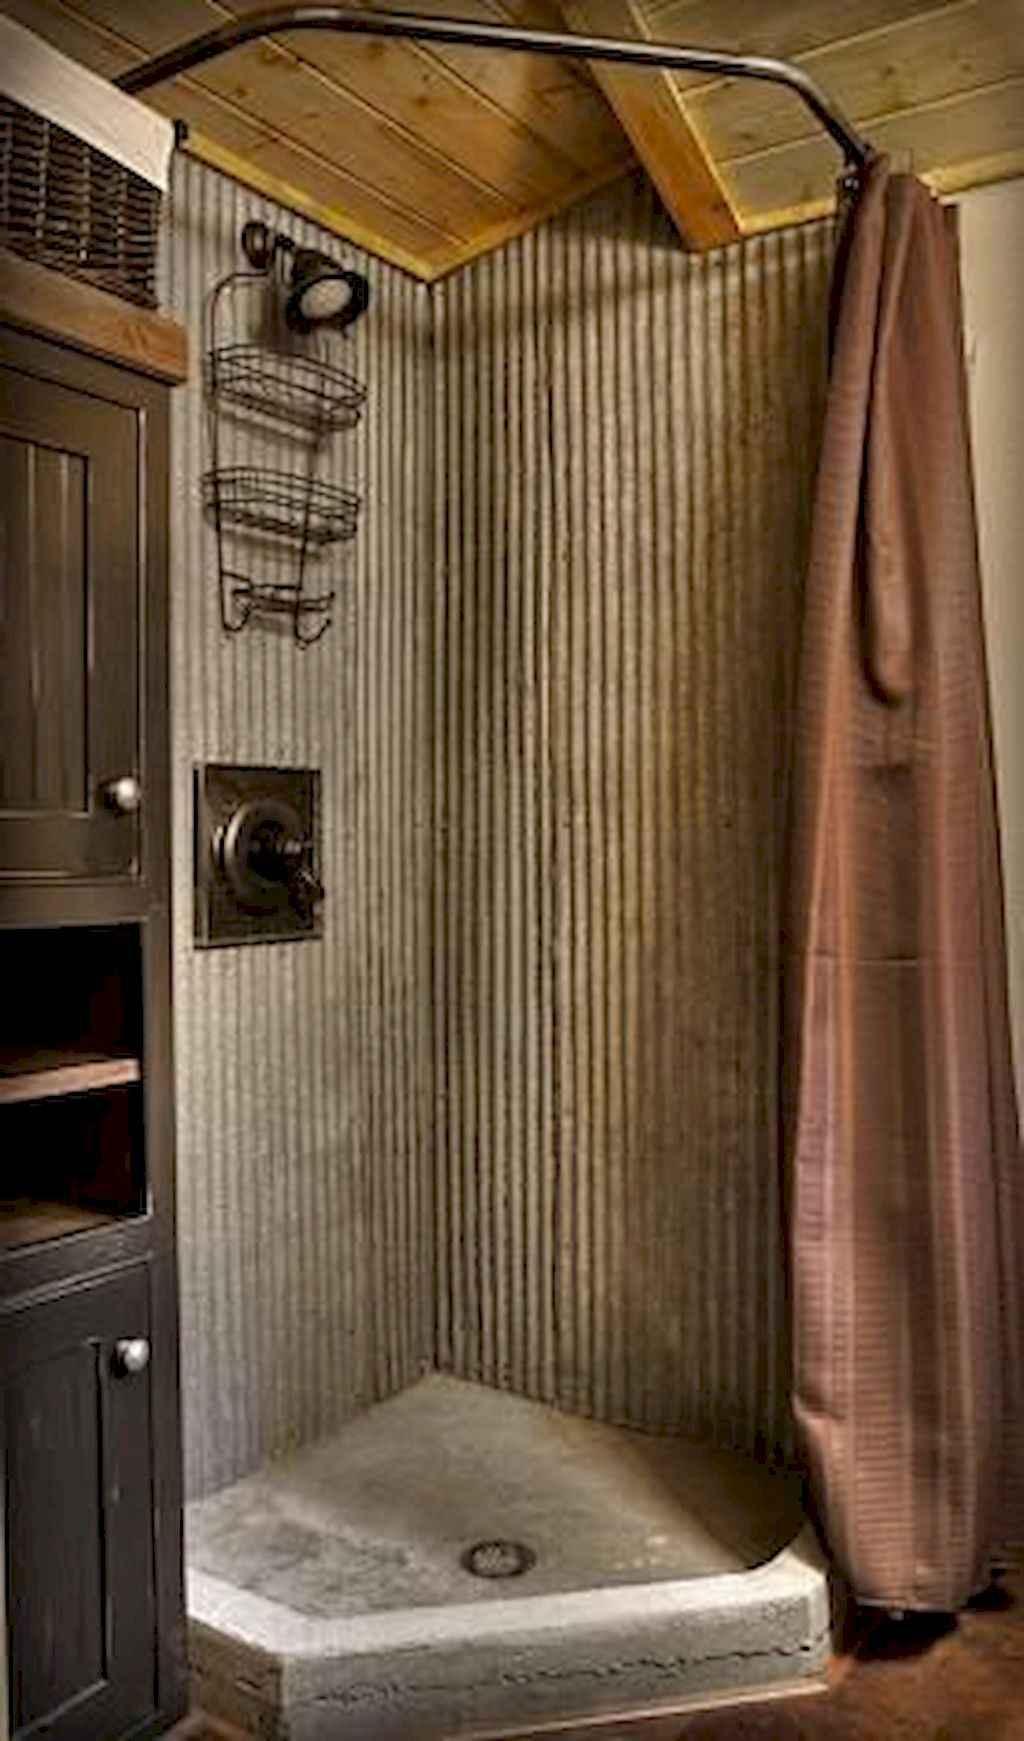 111 Brilliant Small Bathroom Remodel Ideas On A Budget (38)